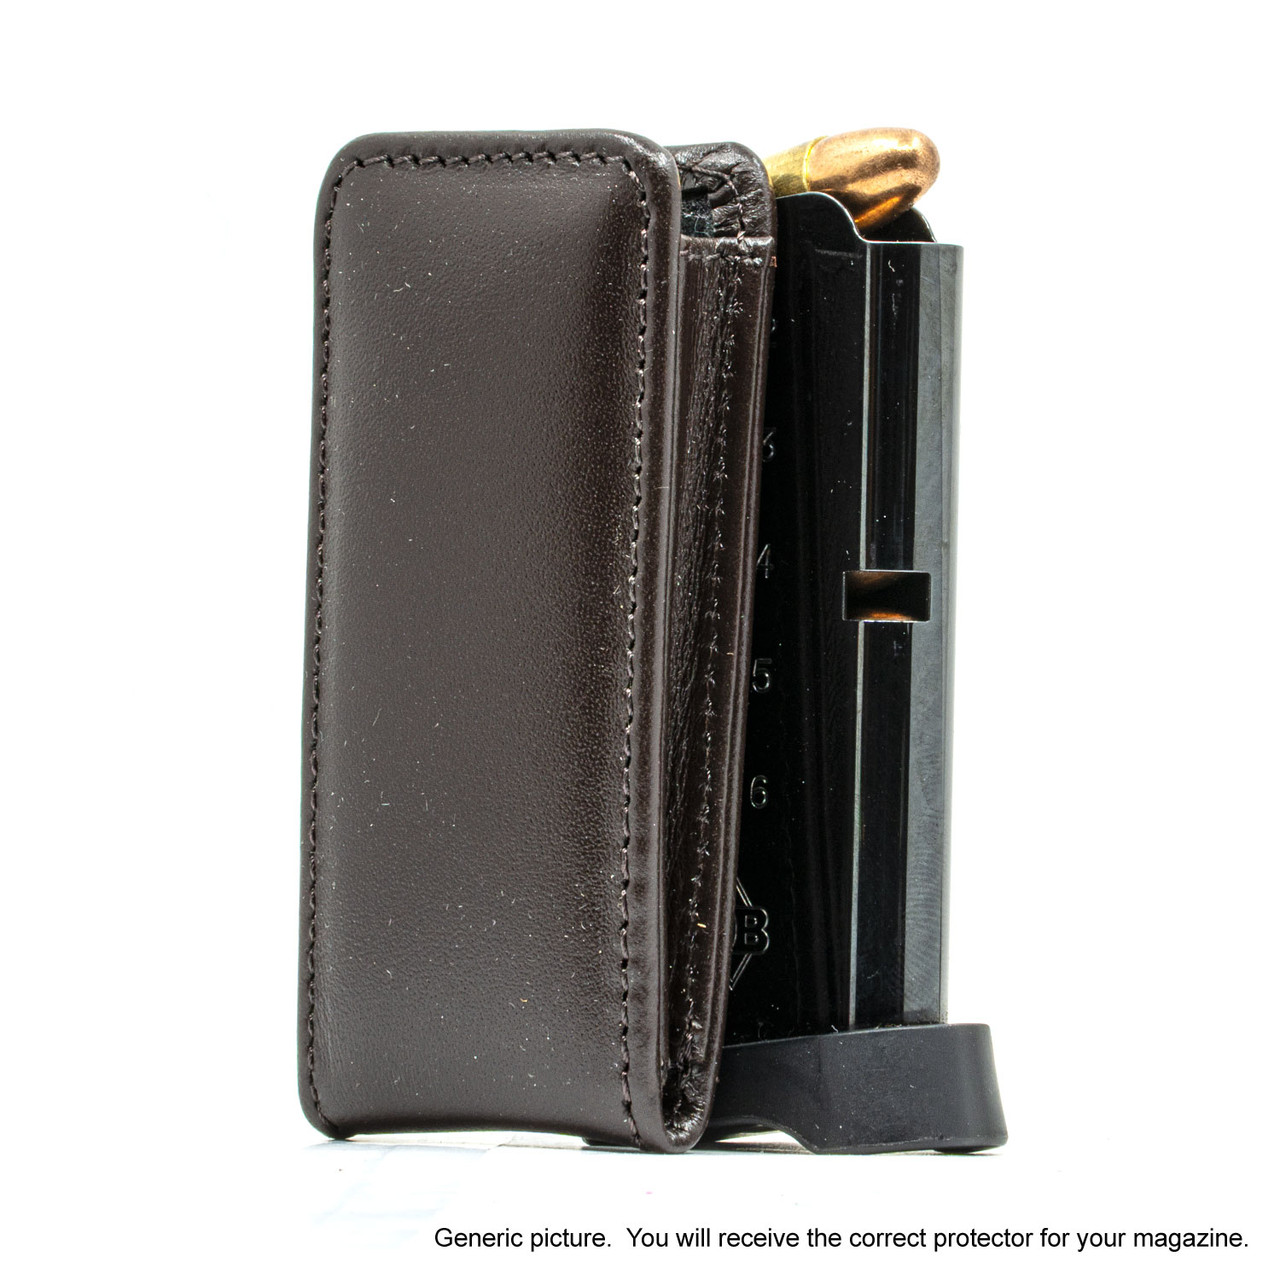 AMT Backup .380 Brown Leather Magazine Pocket Protector